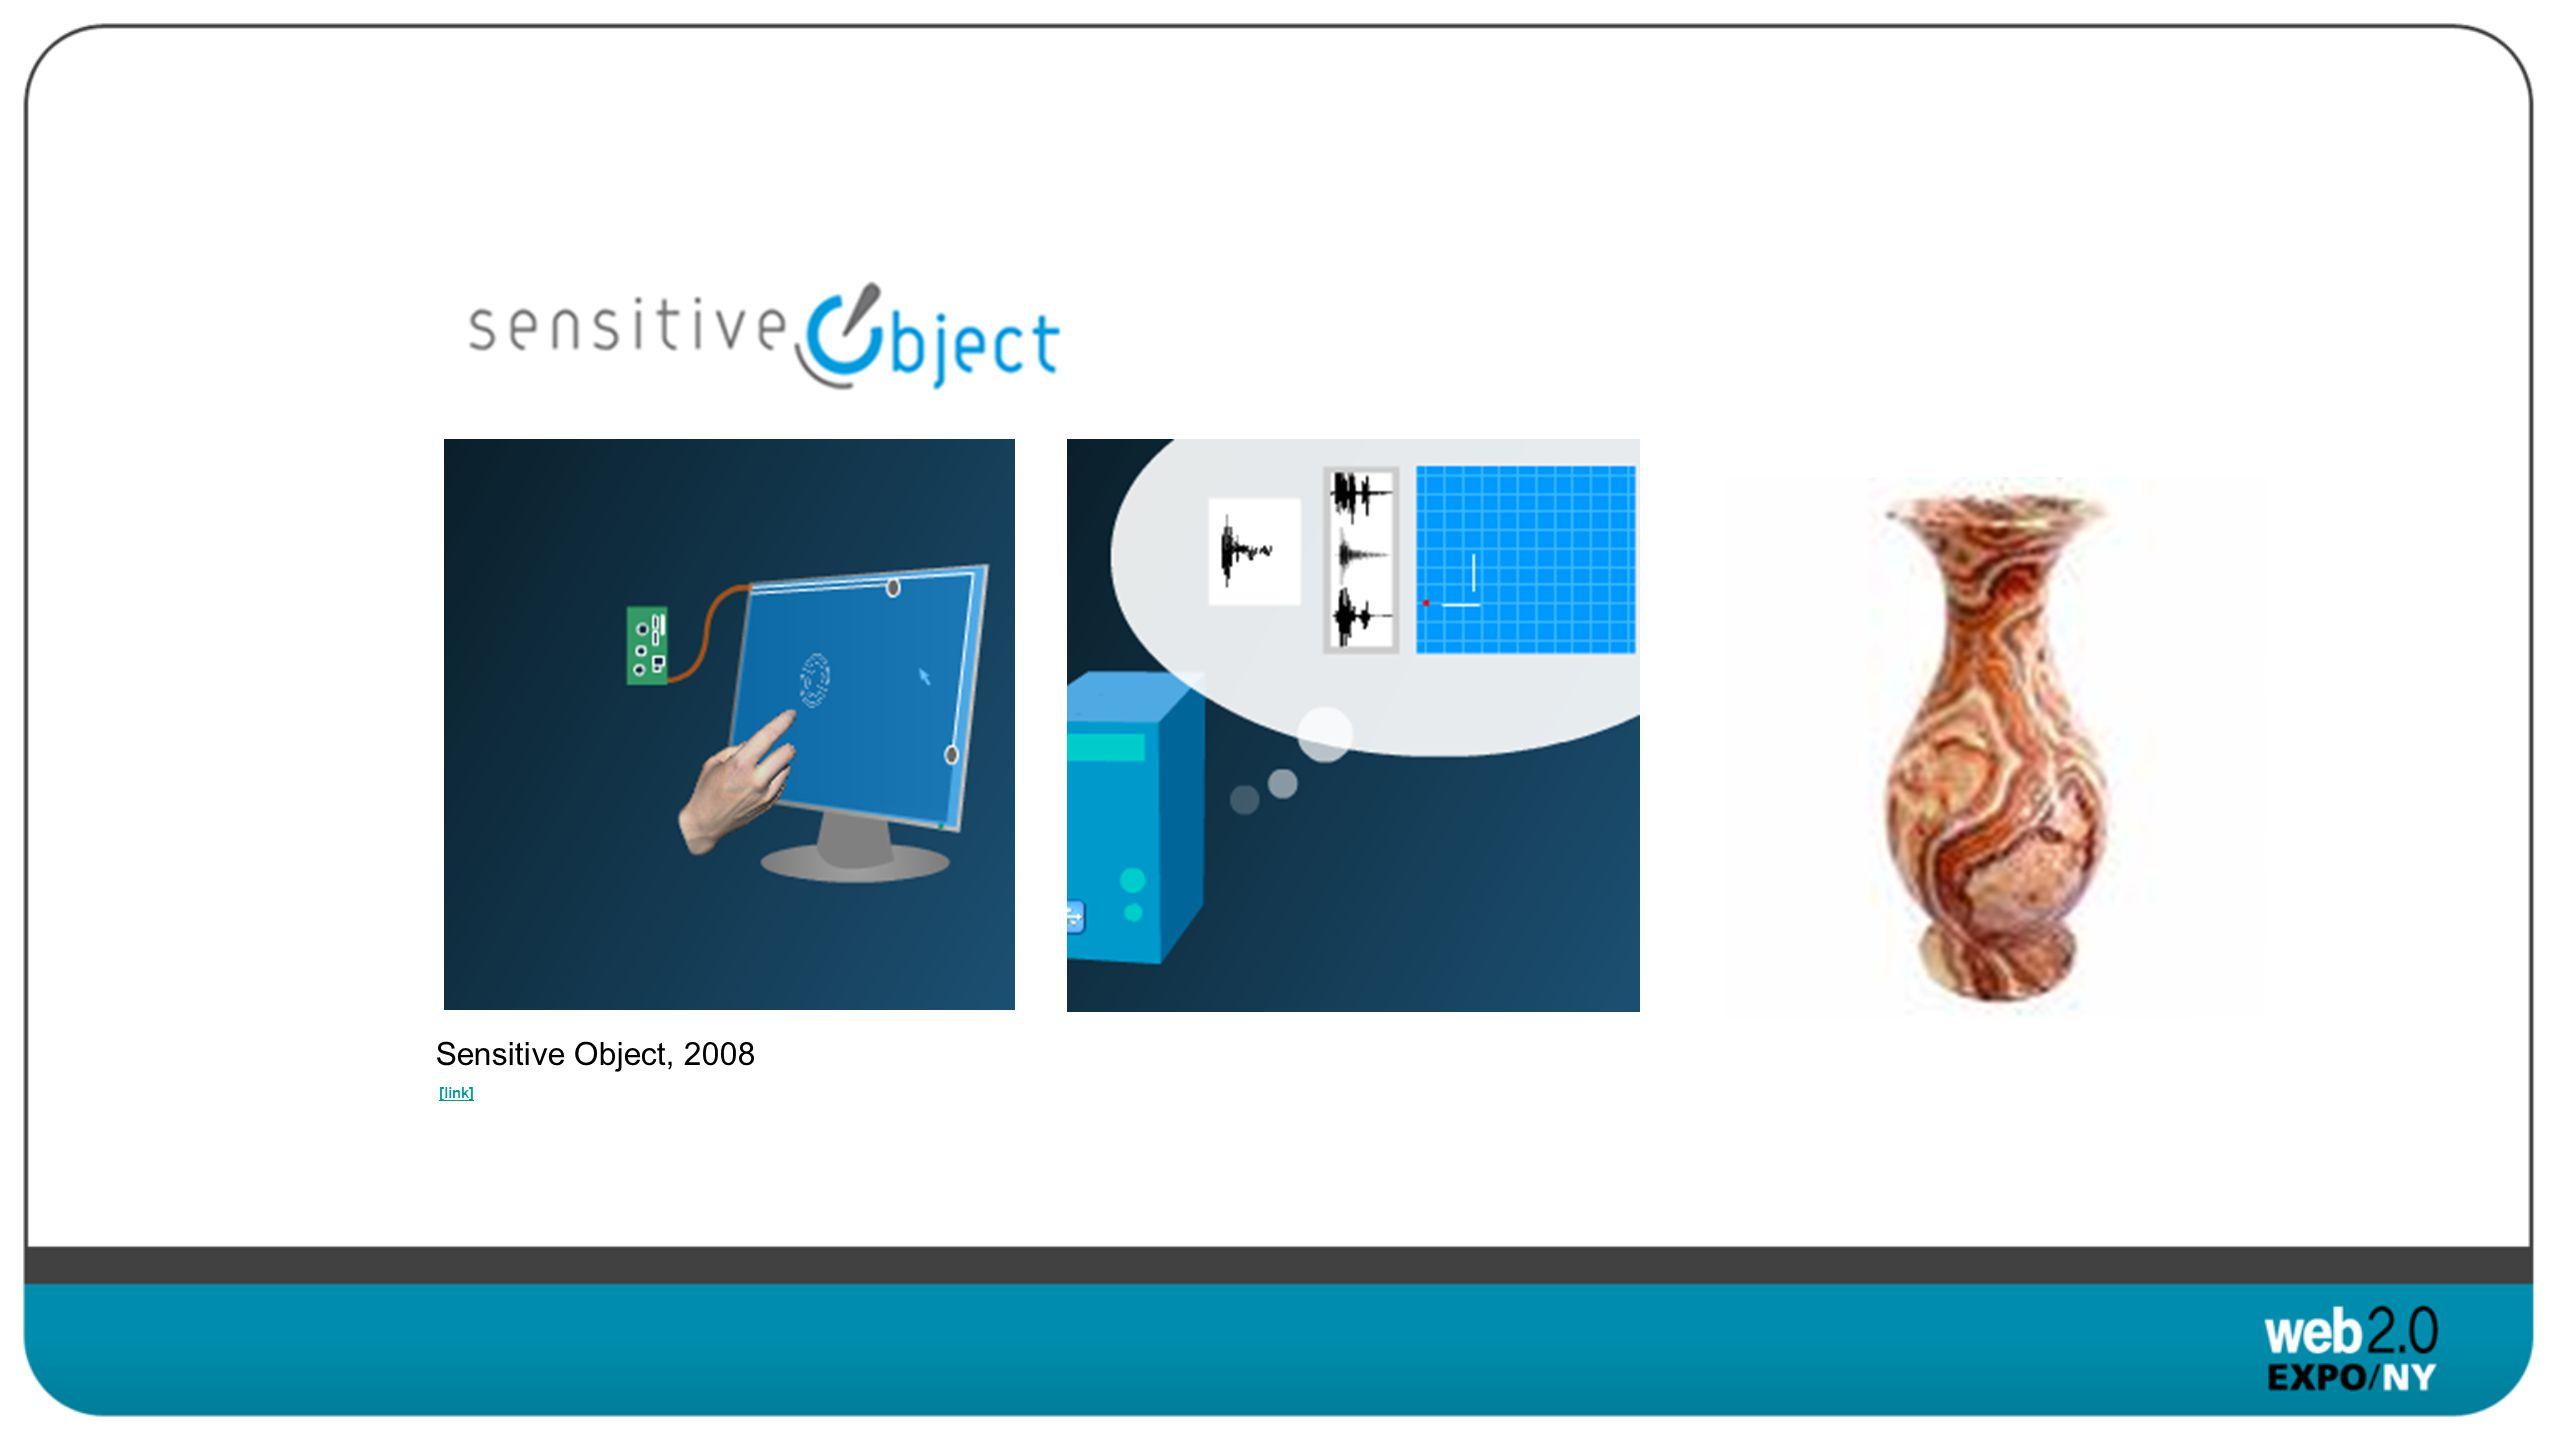 [link] Sensitive Object, 2008